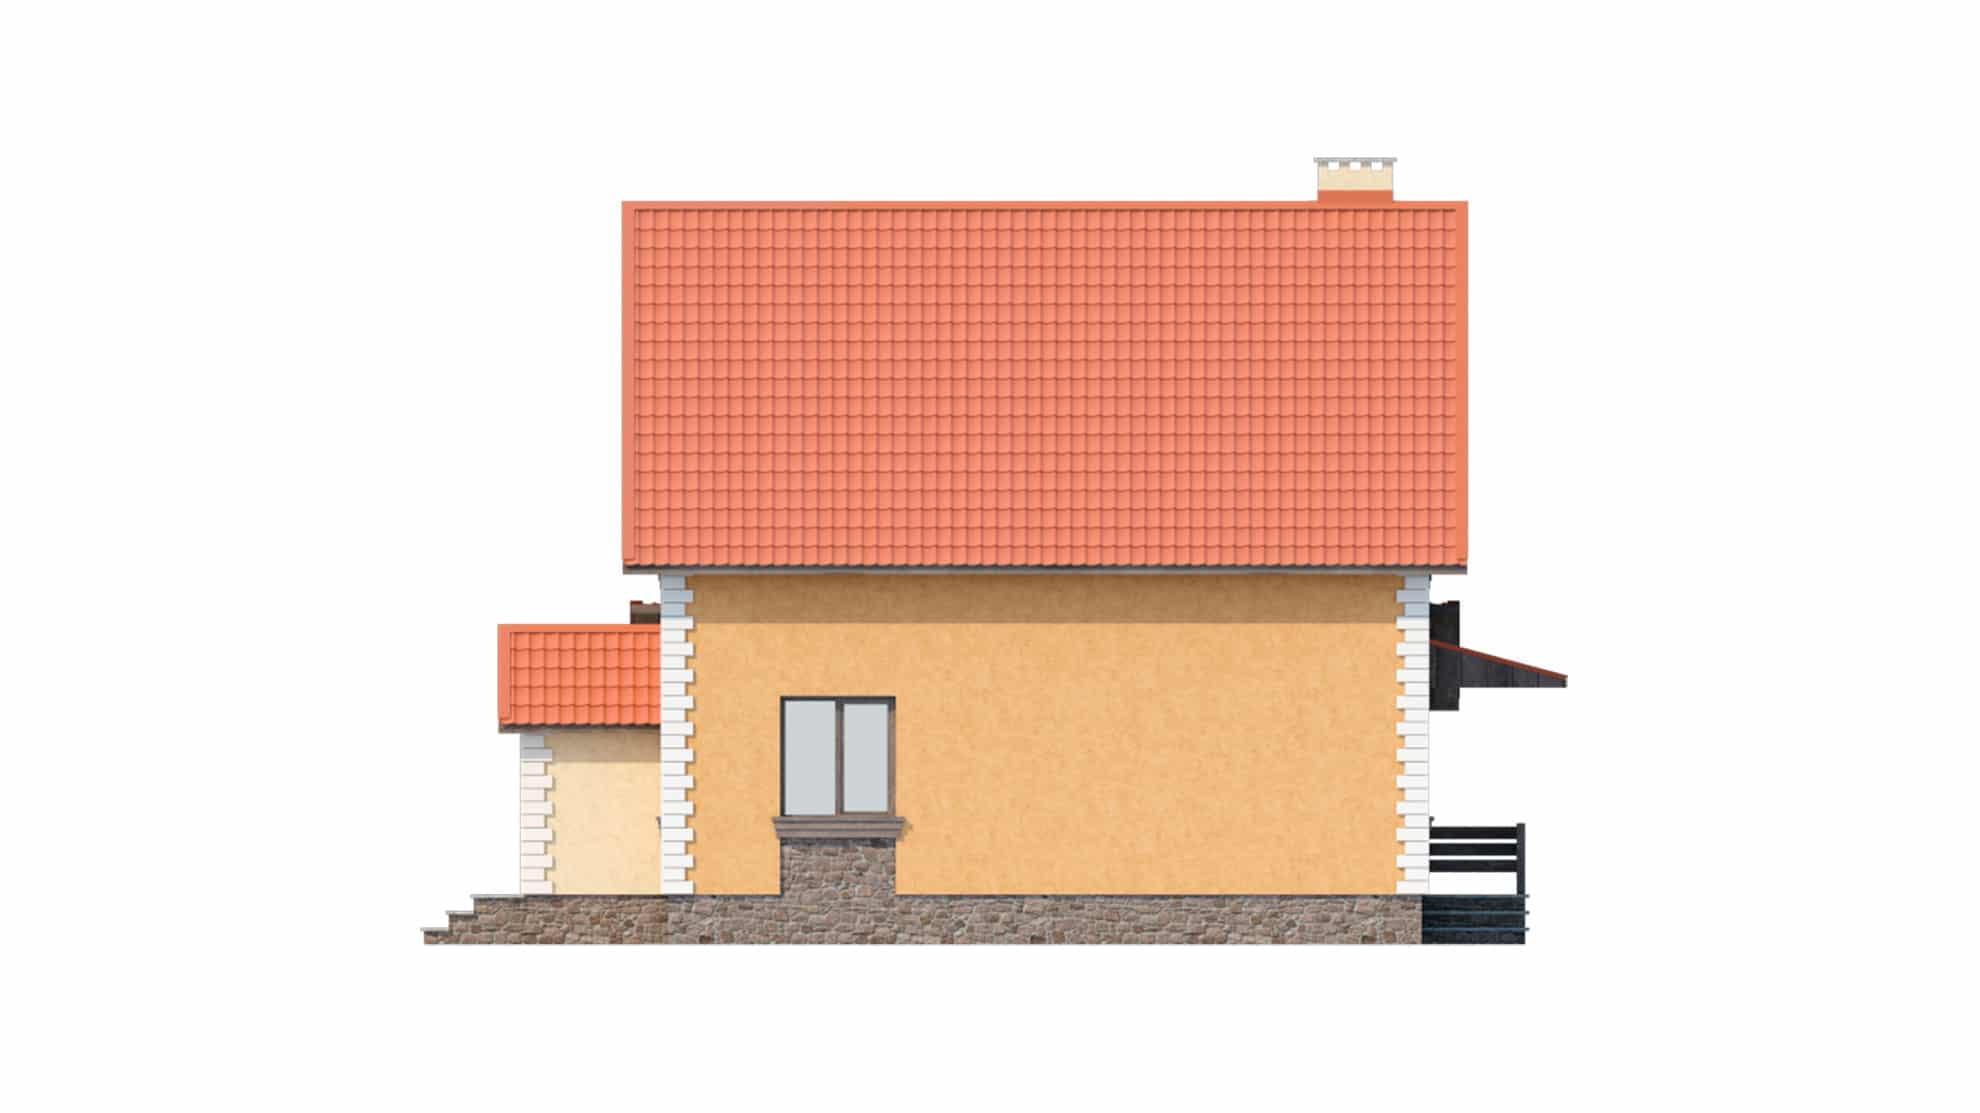 Фасад мансардного дома «КМ-11» - слева